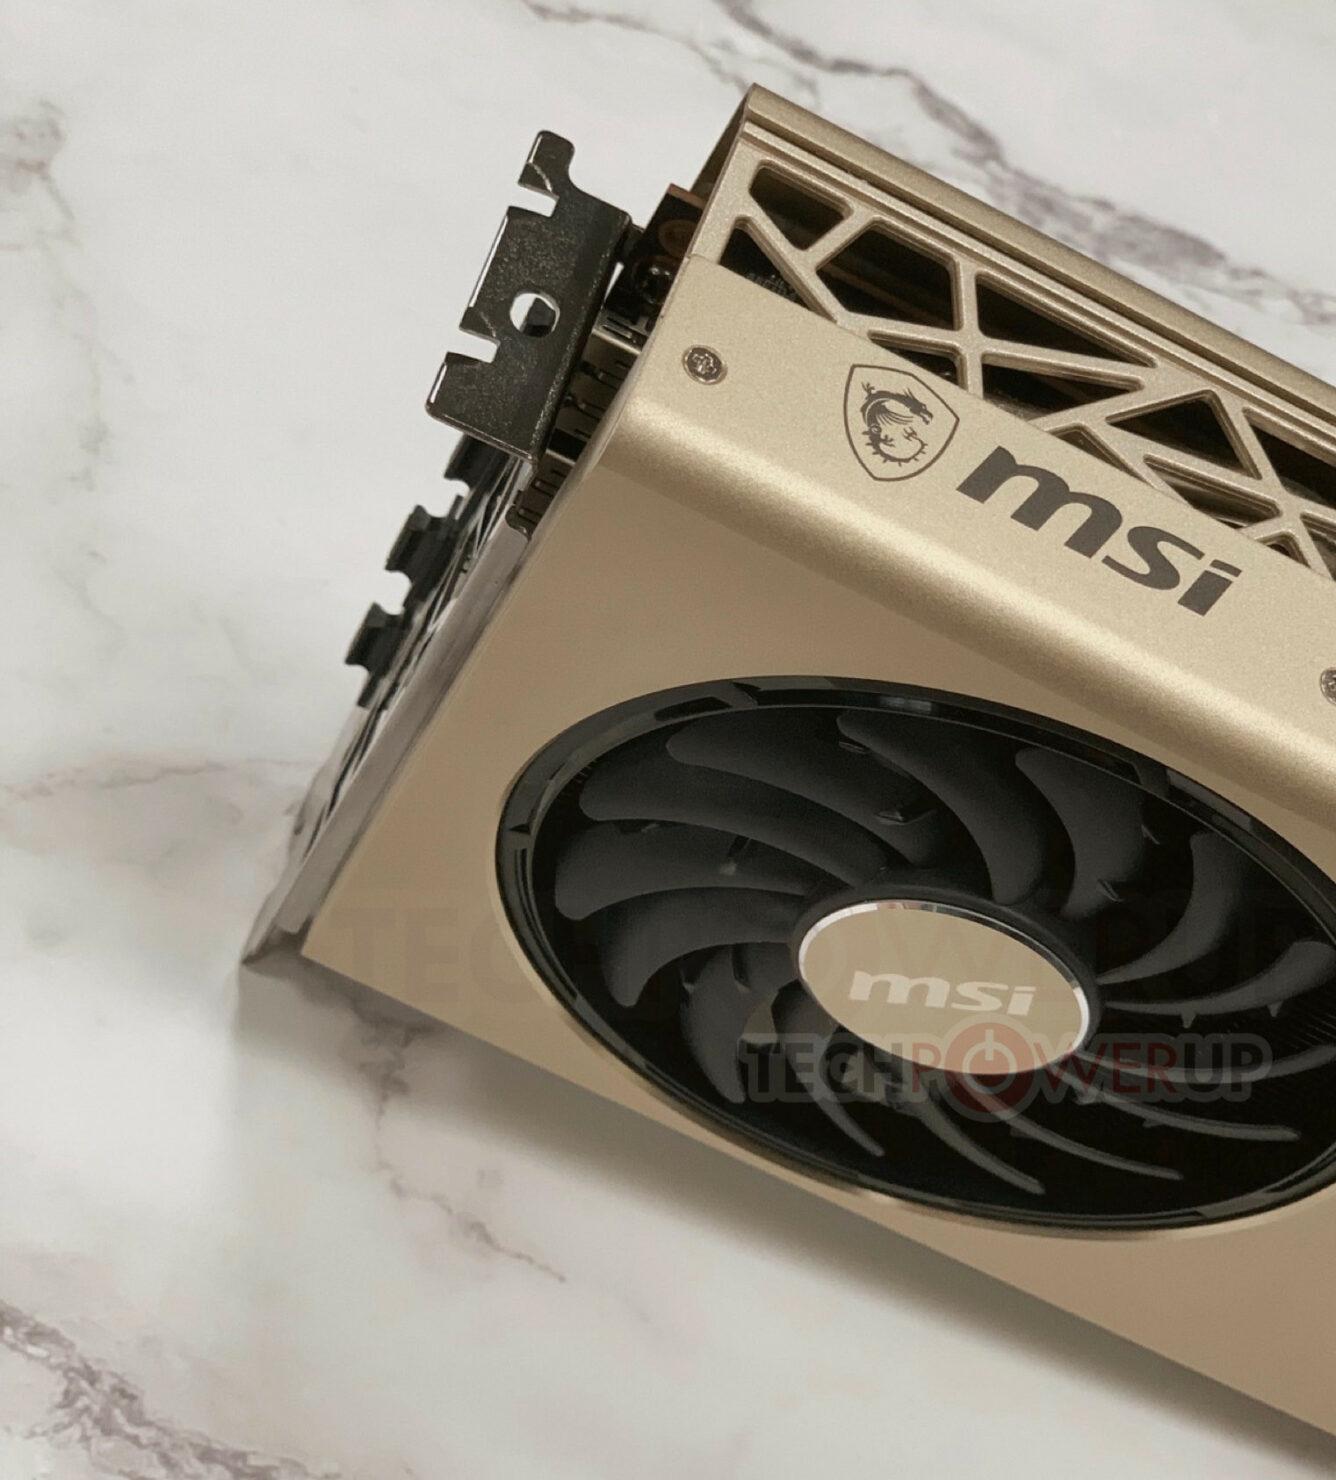 msi-radeon-rx-5700-evoke-series-graphics-card-teaser_techpowerup